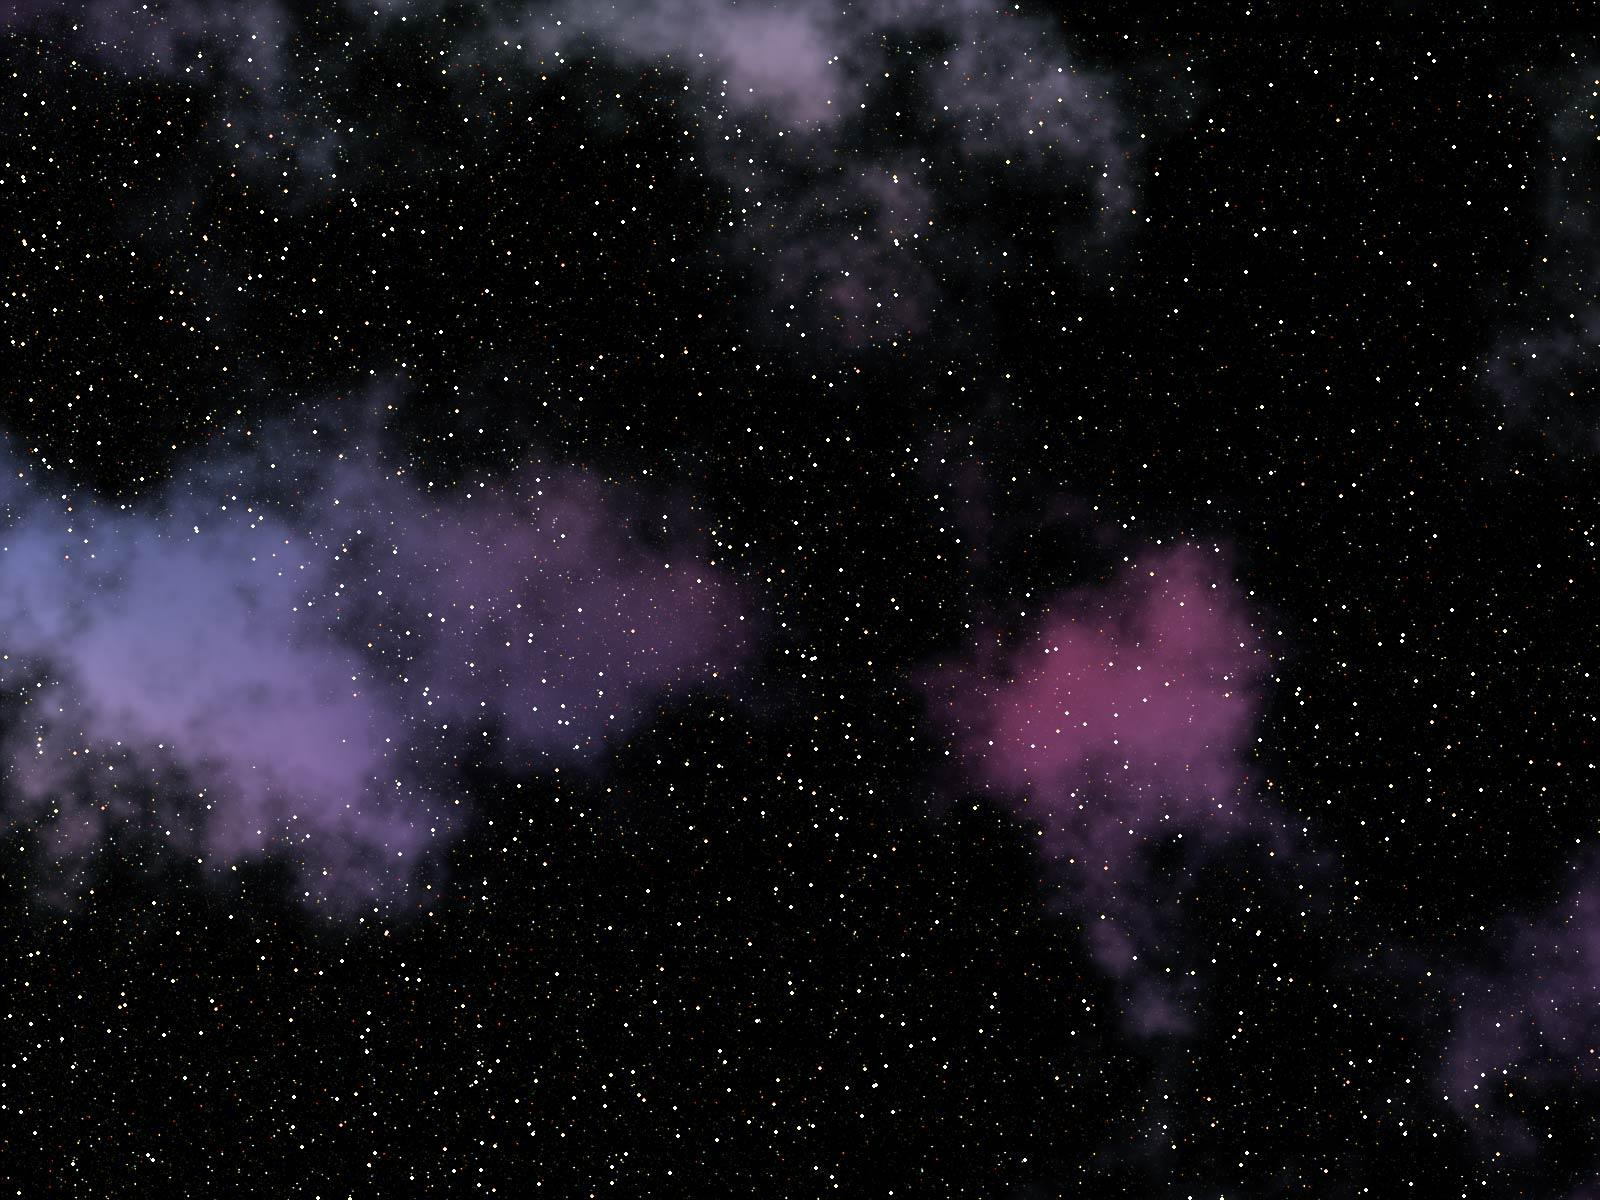 Black Galaxy Backgrounds Tumblr Wallpaper Cave